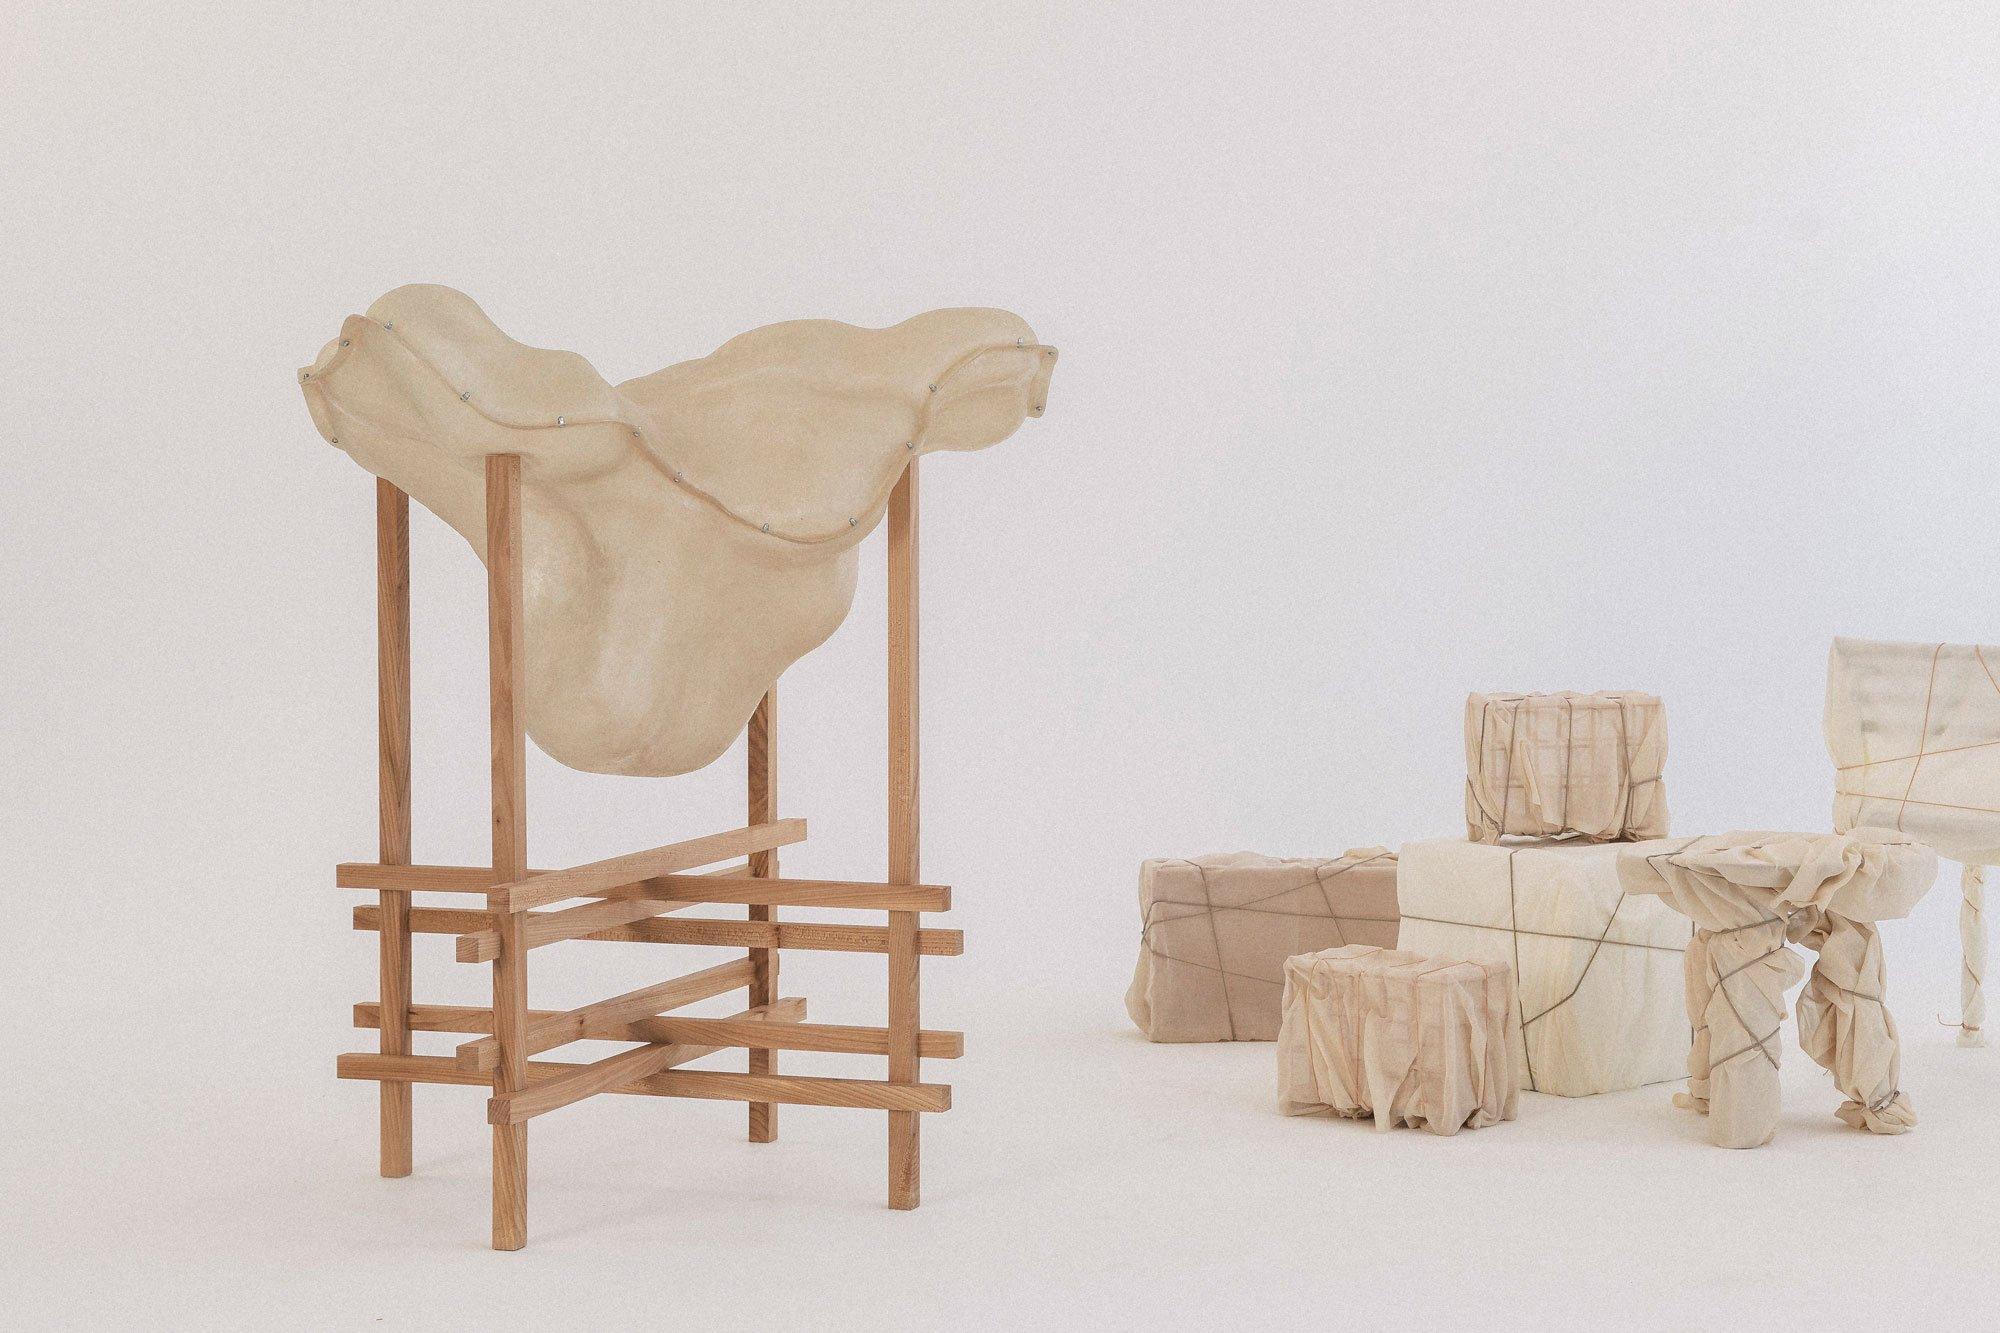 Ukurant Objects, 3daysofdesign 2020, jeunes designers, Laerke Ryom